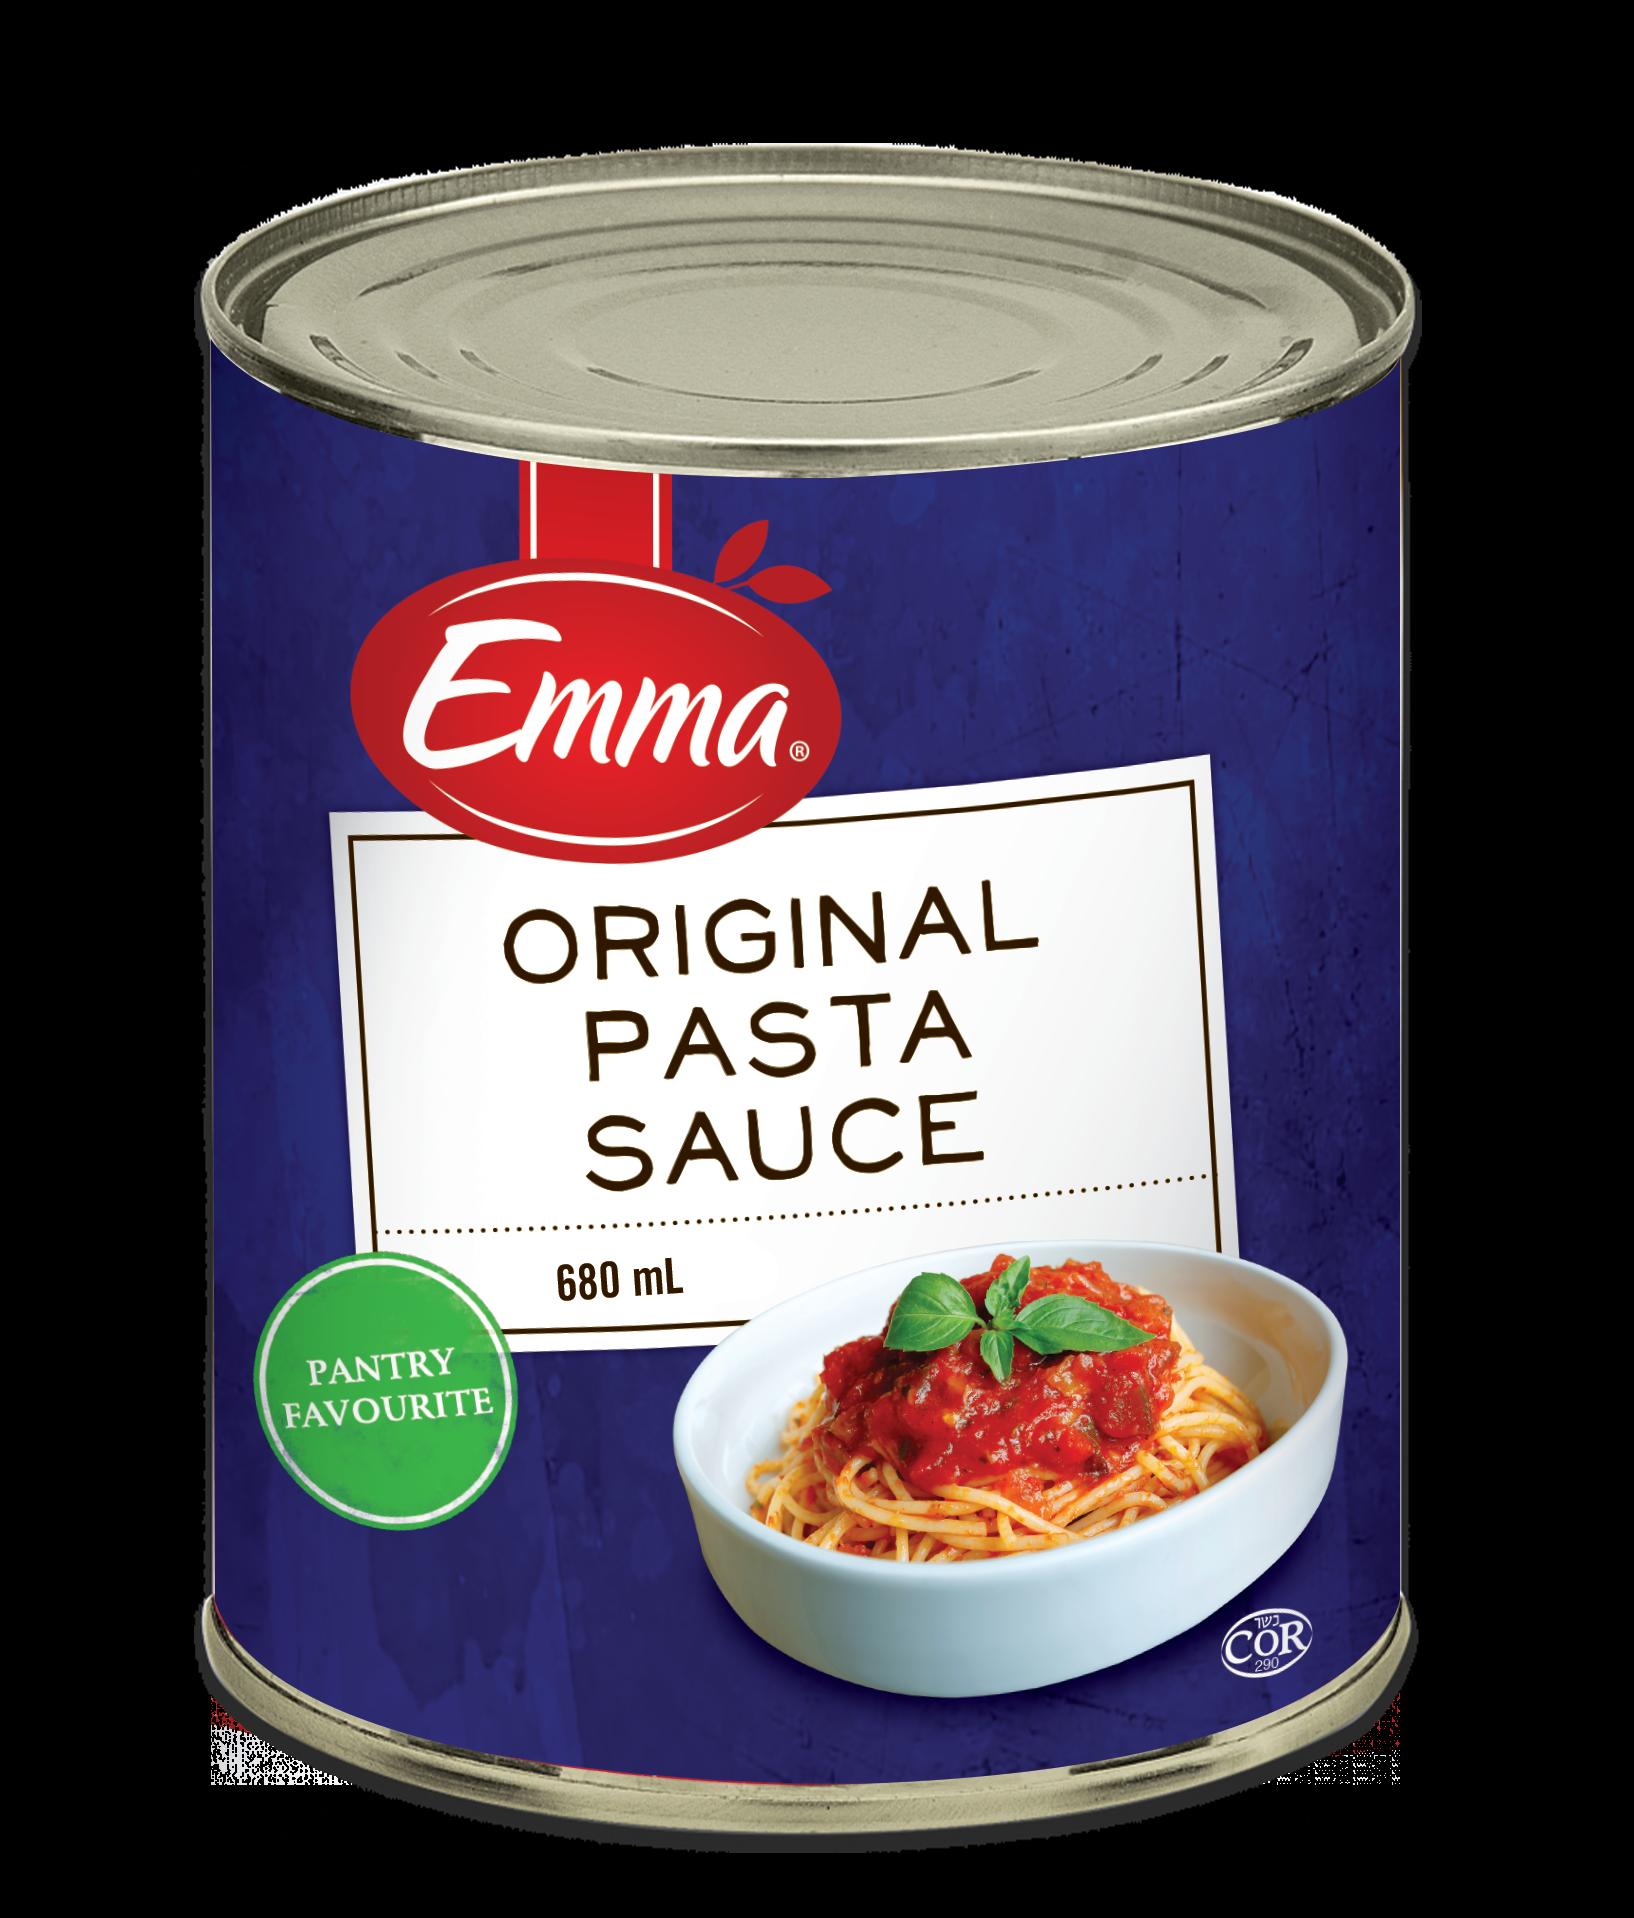 Emma Original Pasta Sauce